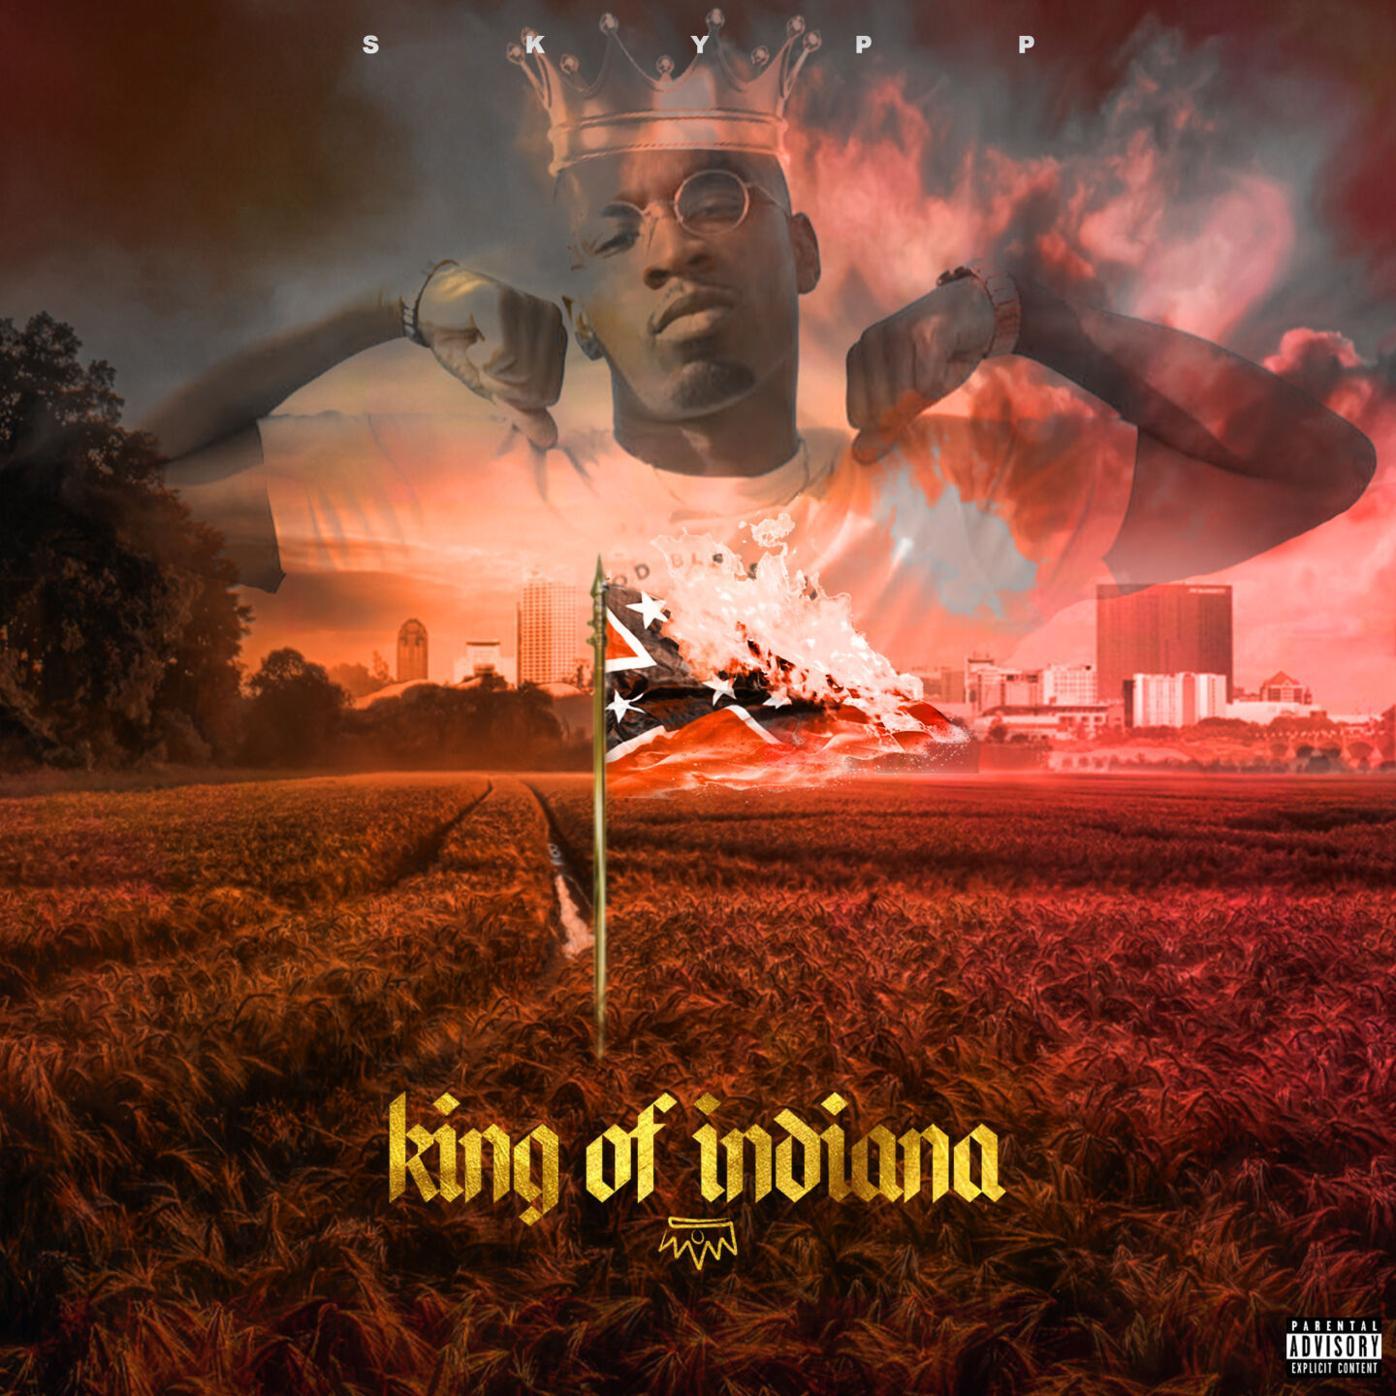 King of Indiana album art